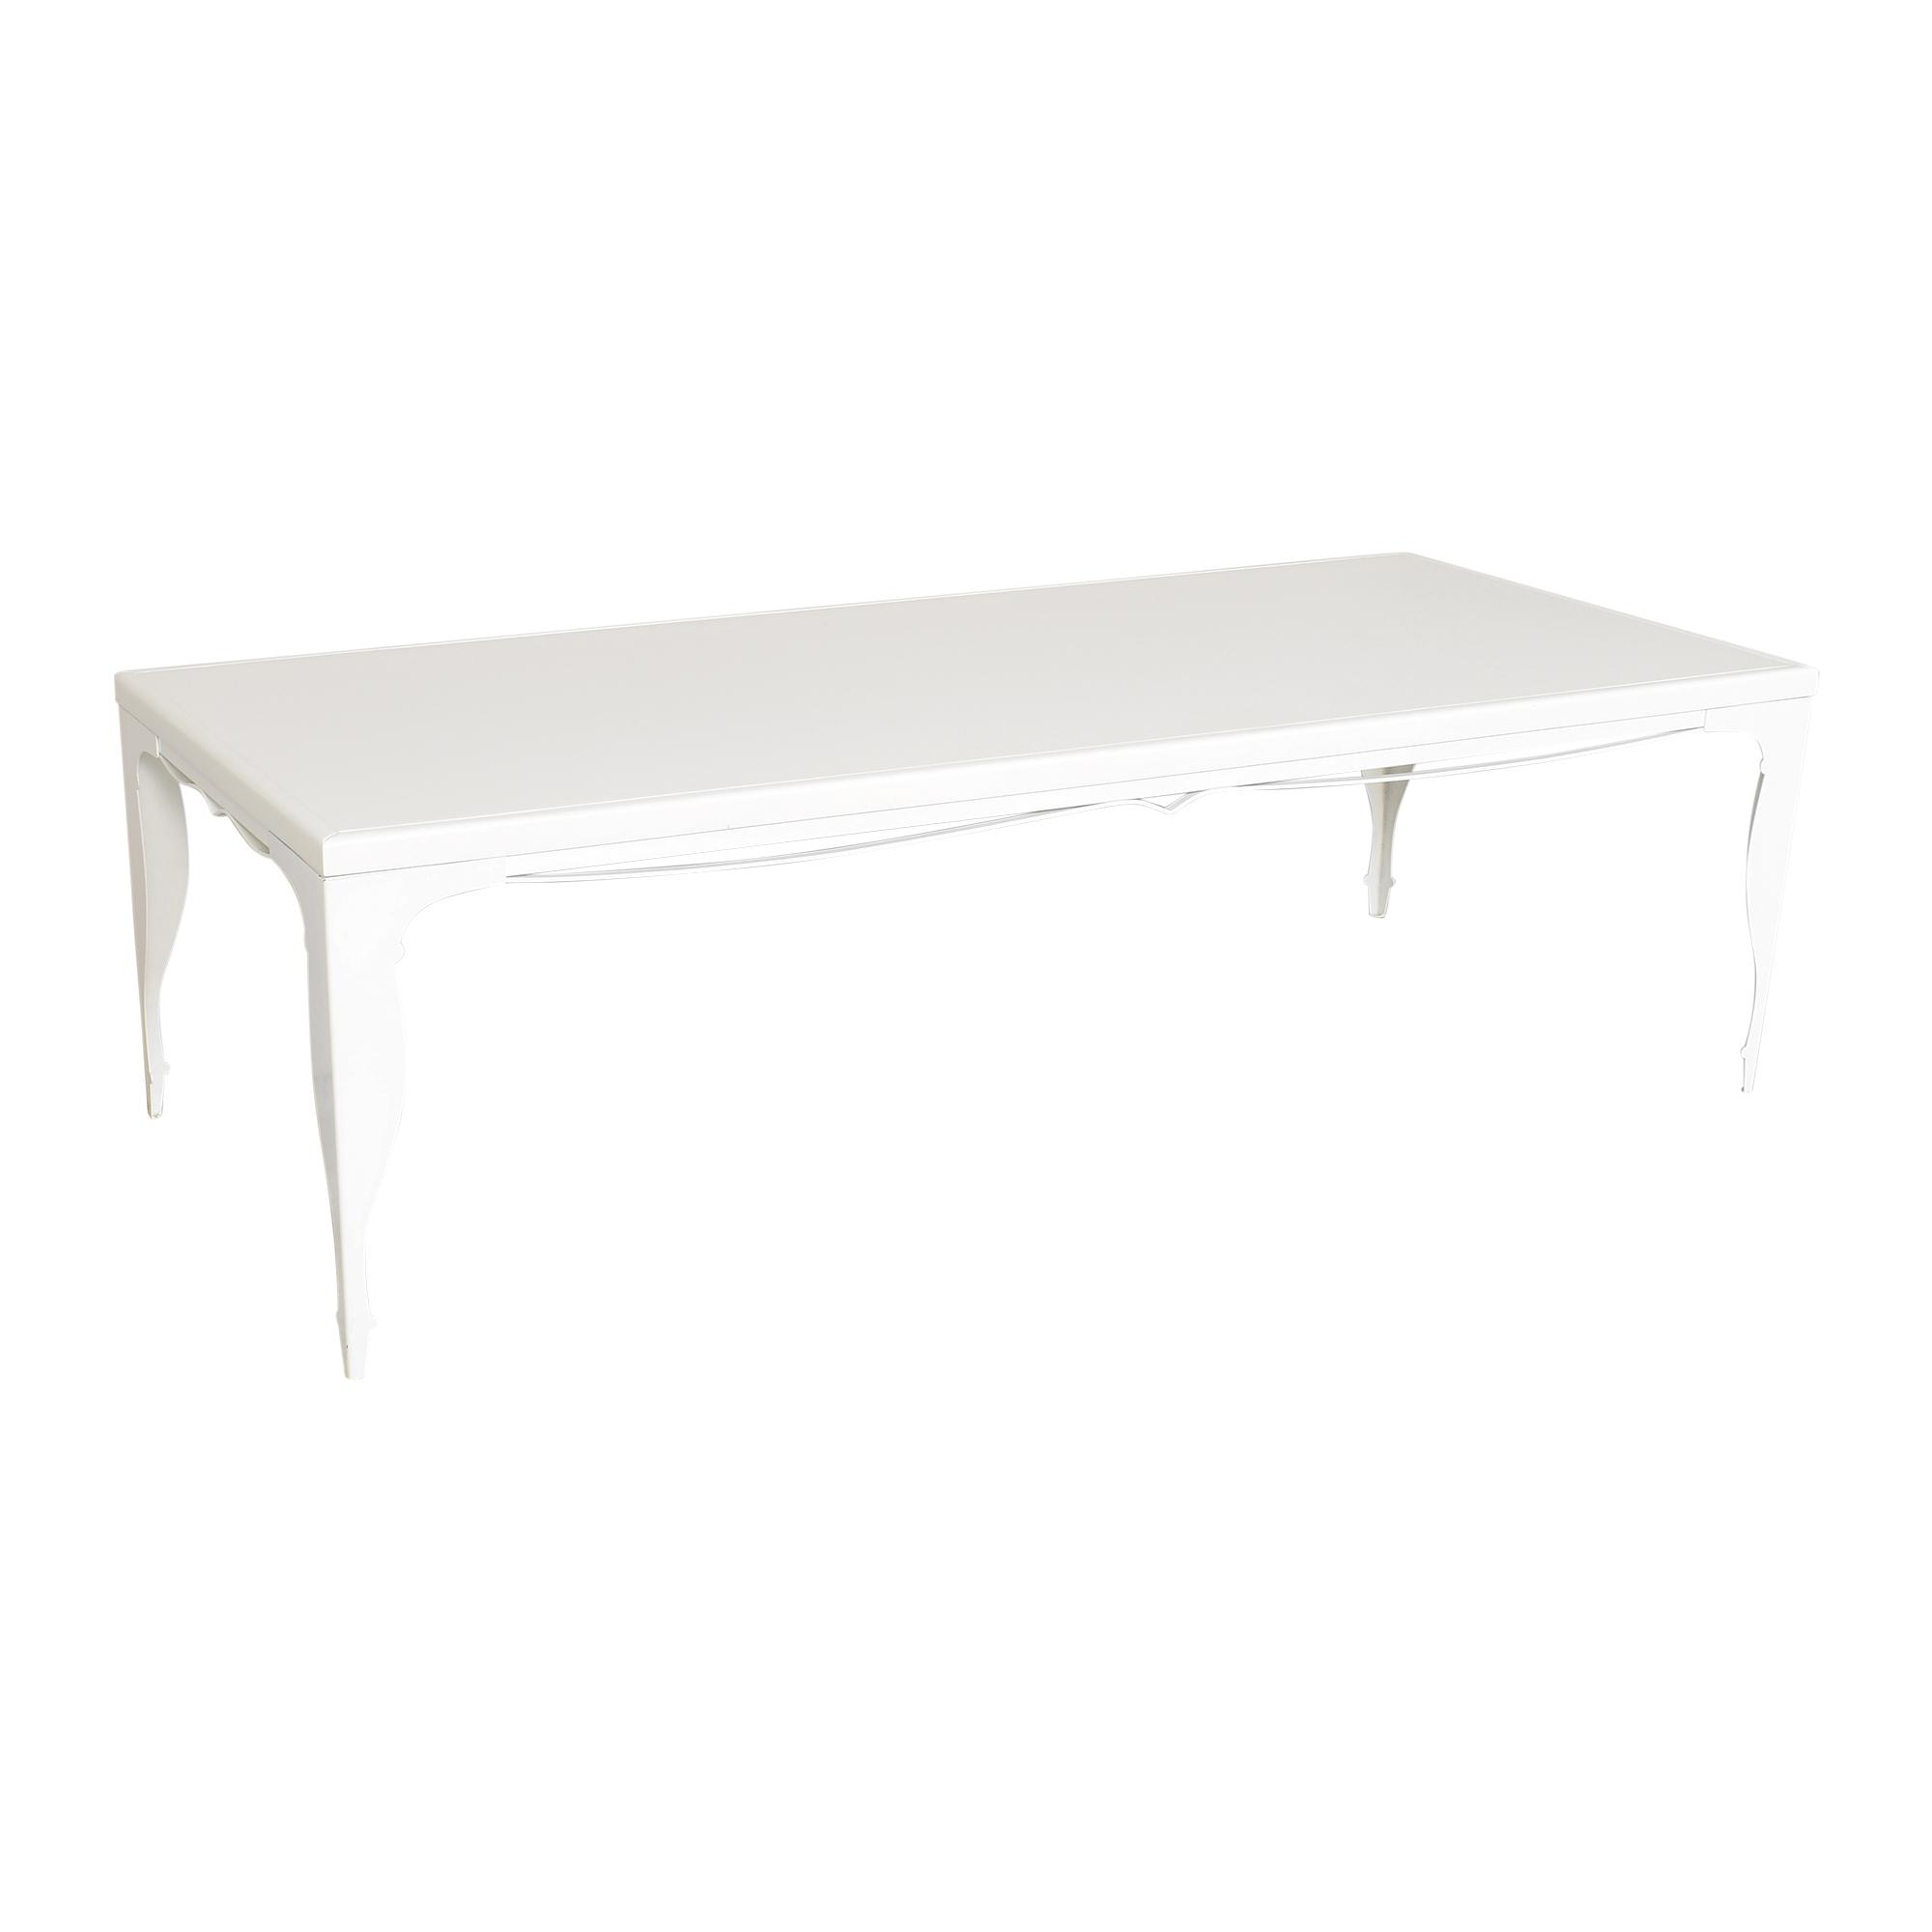 buy Modloft Rectangular Dining Table Modloft Tables